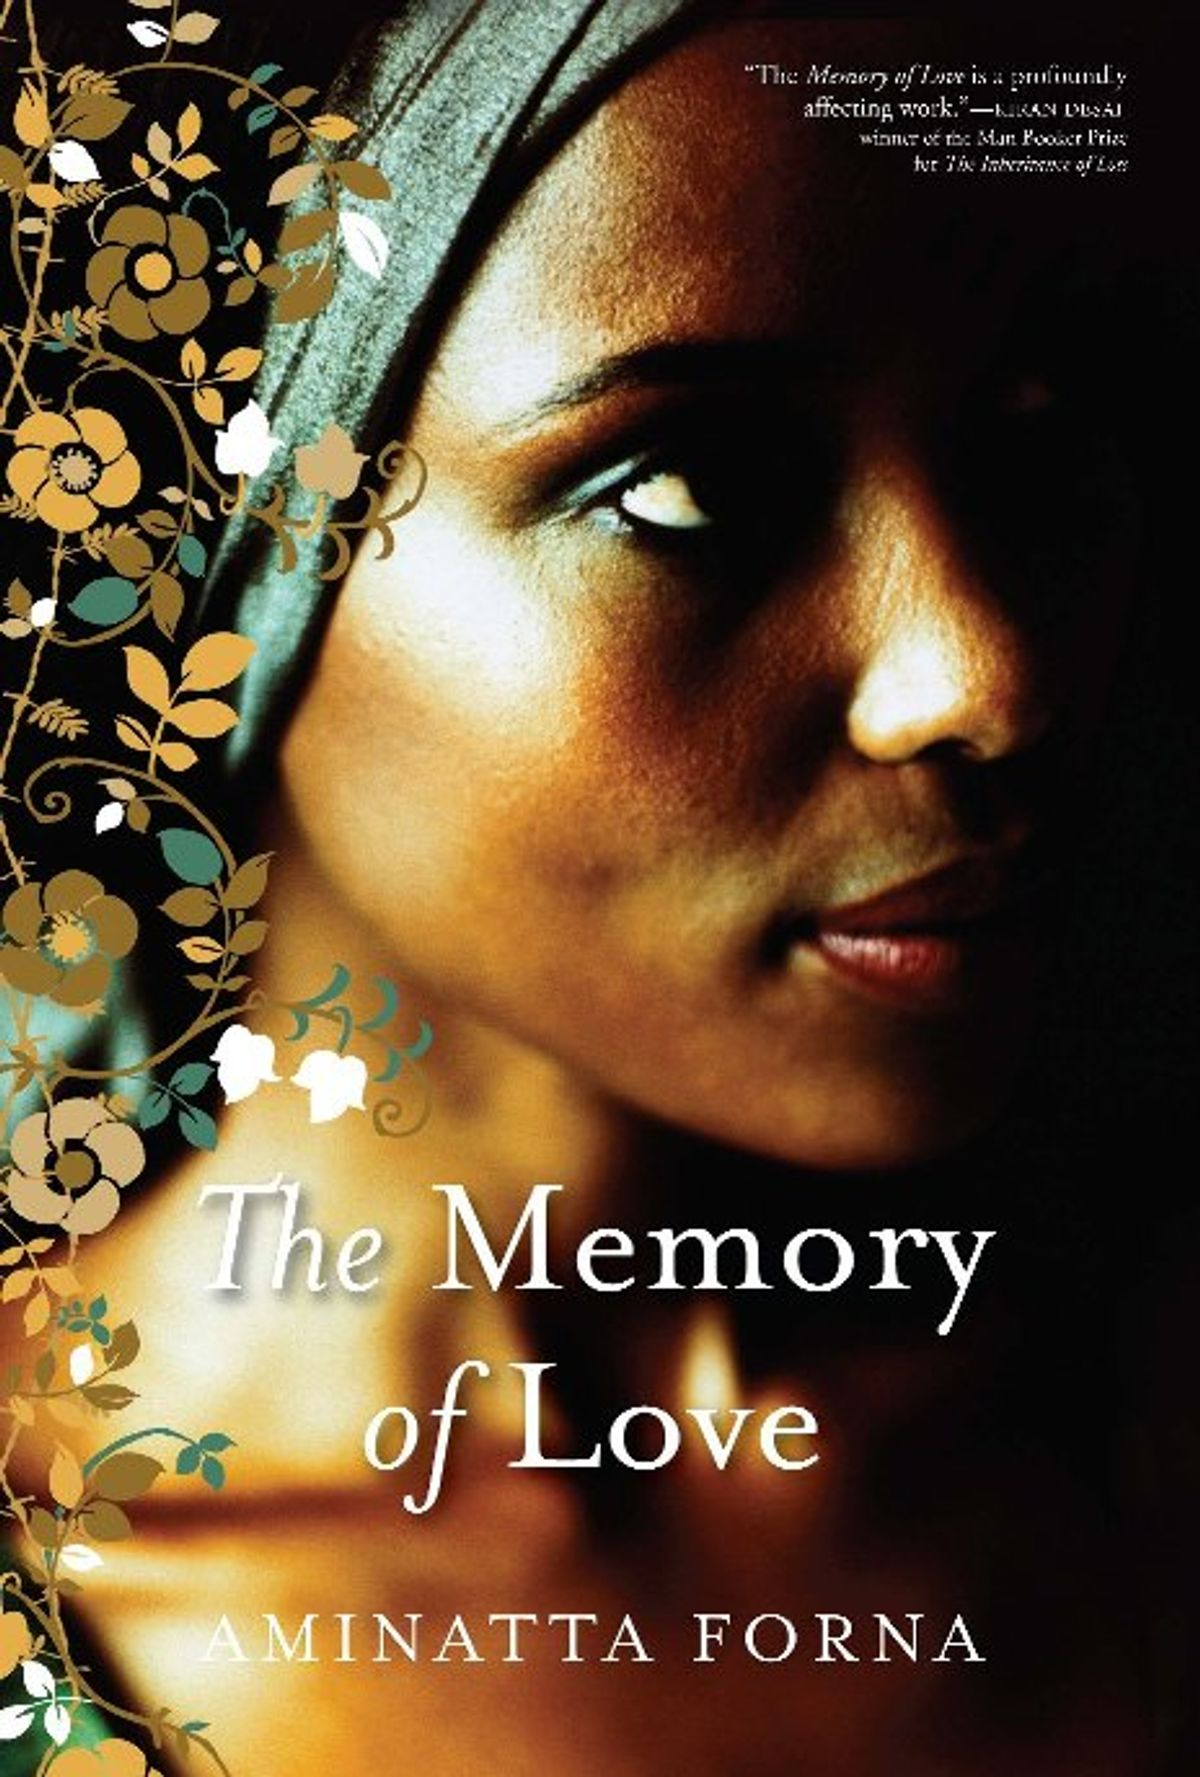 """The Memory of Love"" by Aminatta Forna (Wendy)"